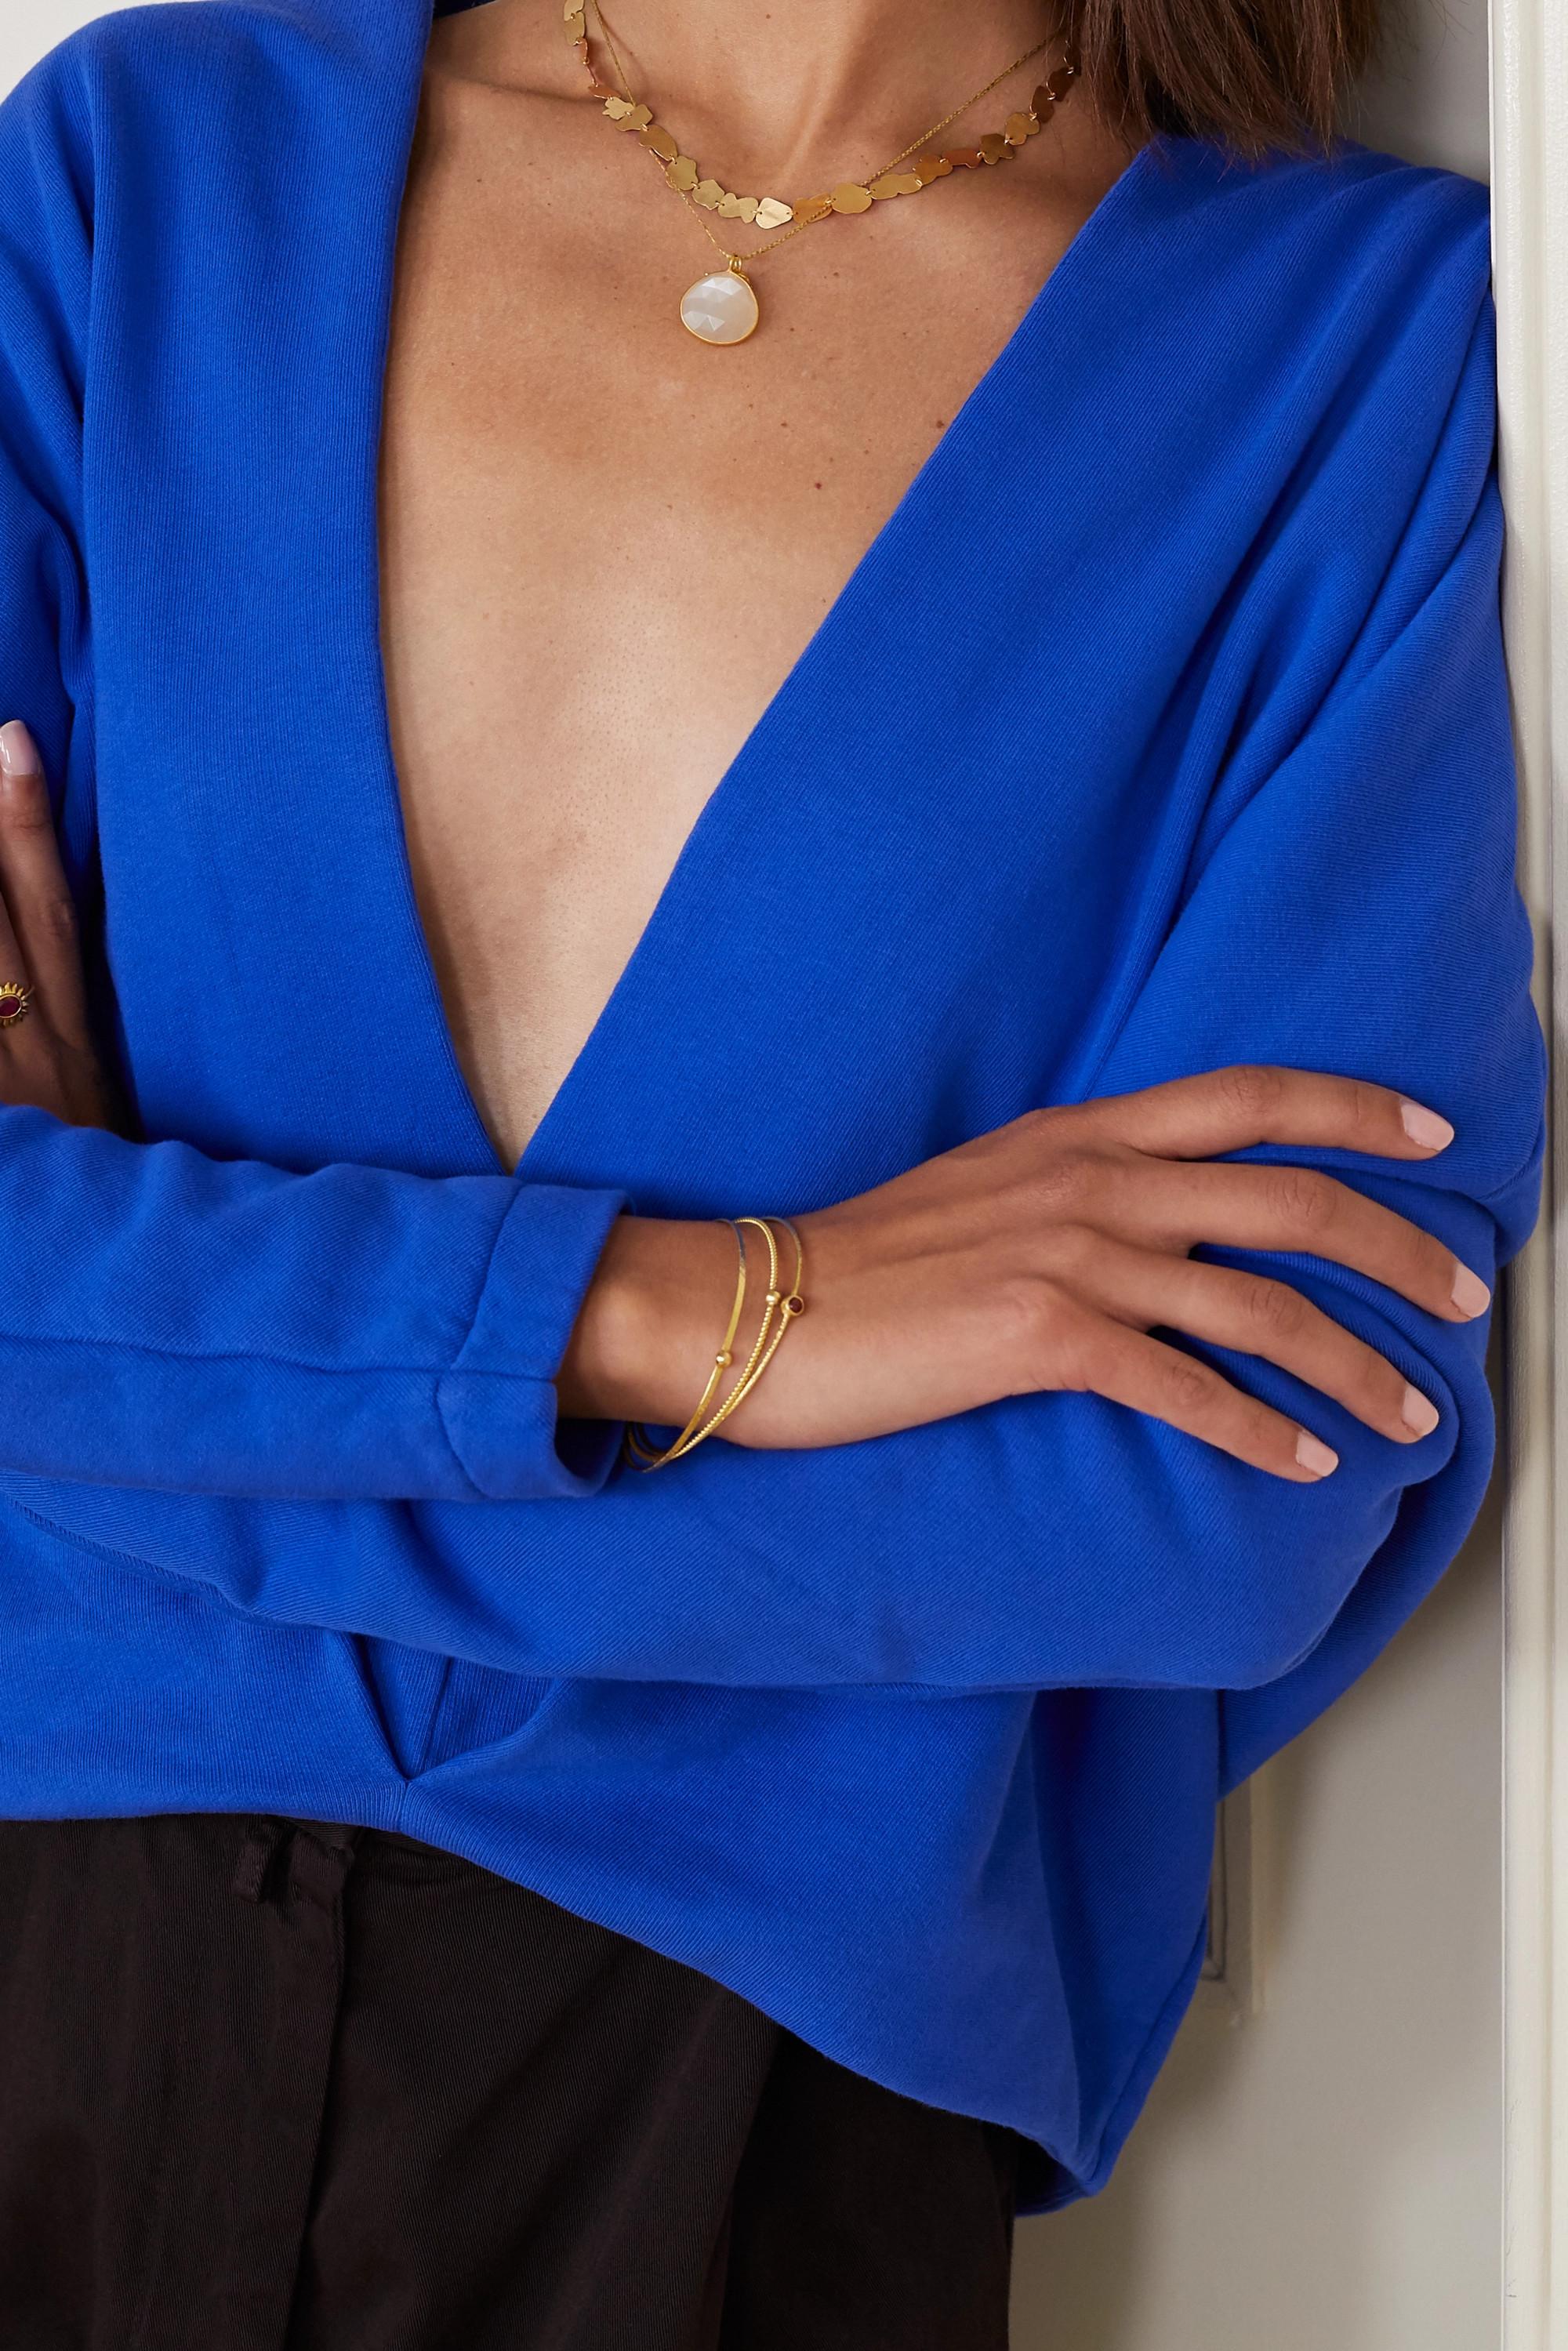 Pippa Small + NET SUSTAIN 18-karat gold necklace